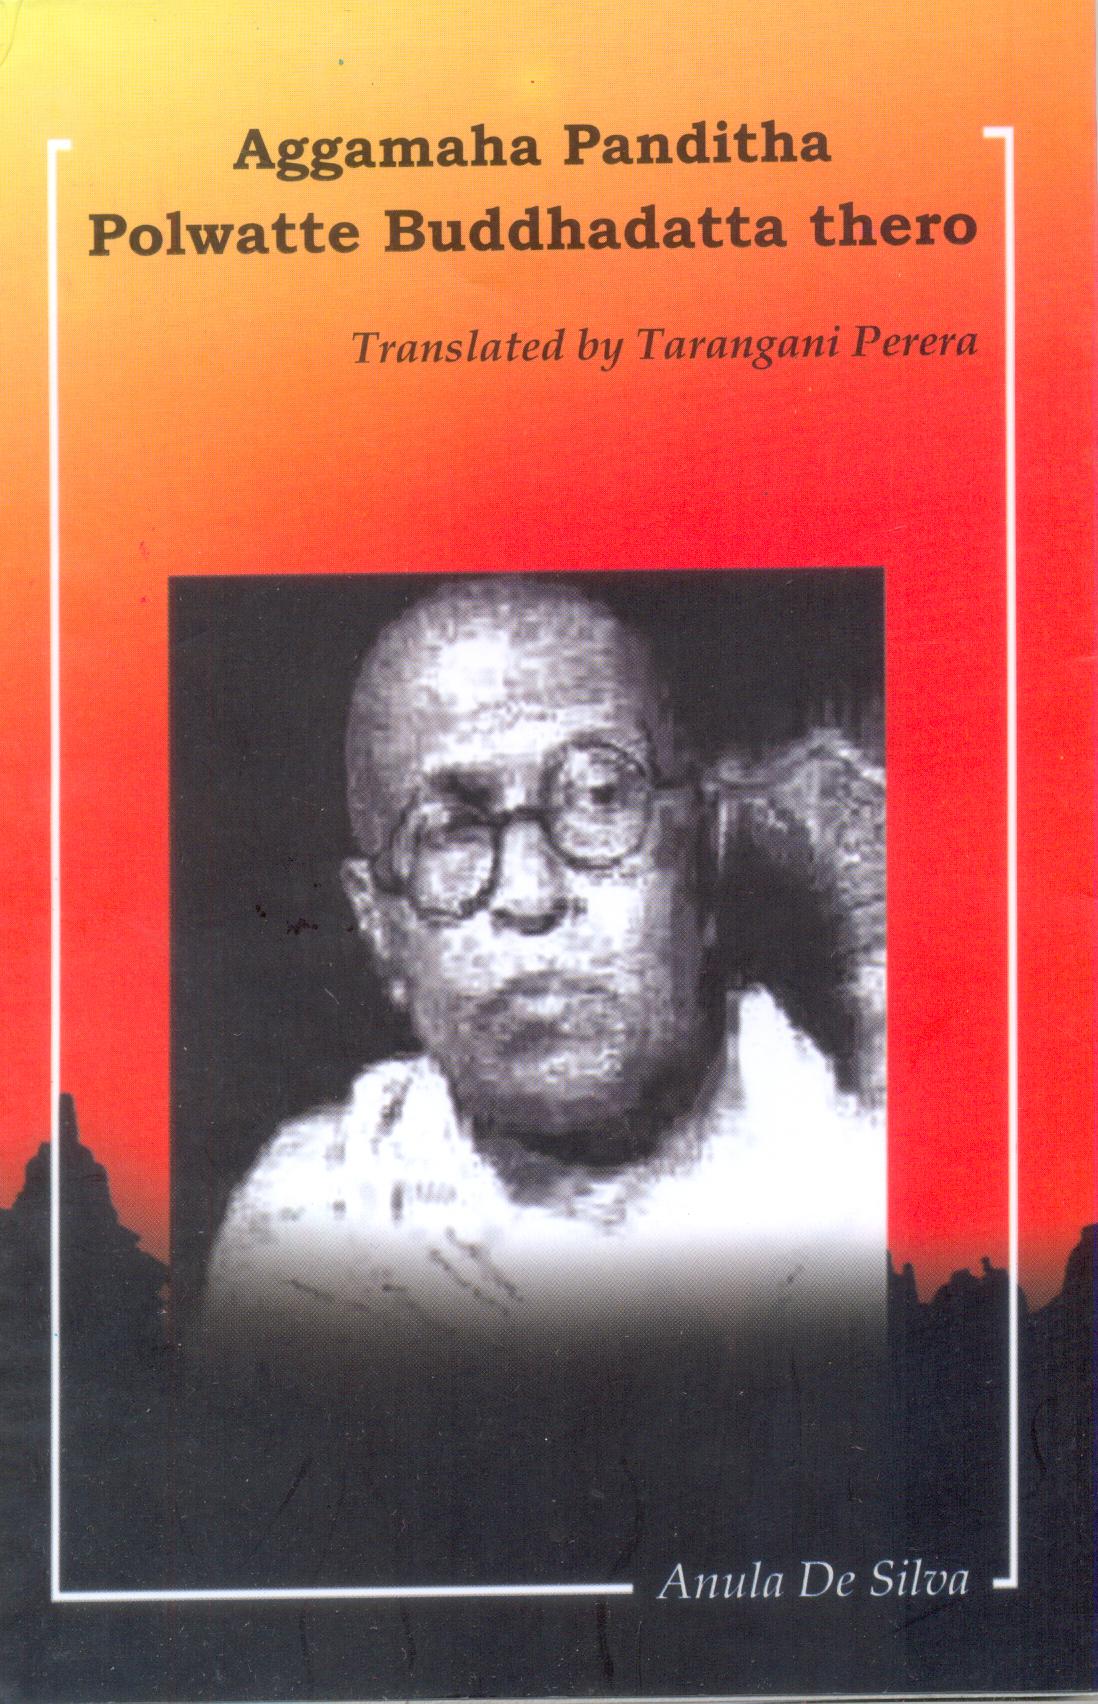 Aggamaha Panditha Polwatte Buddhadatta Thero